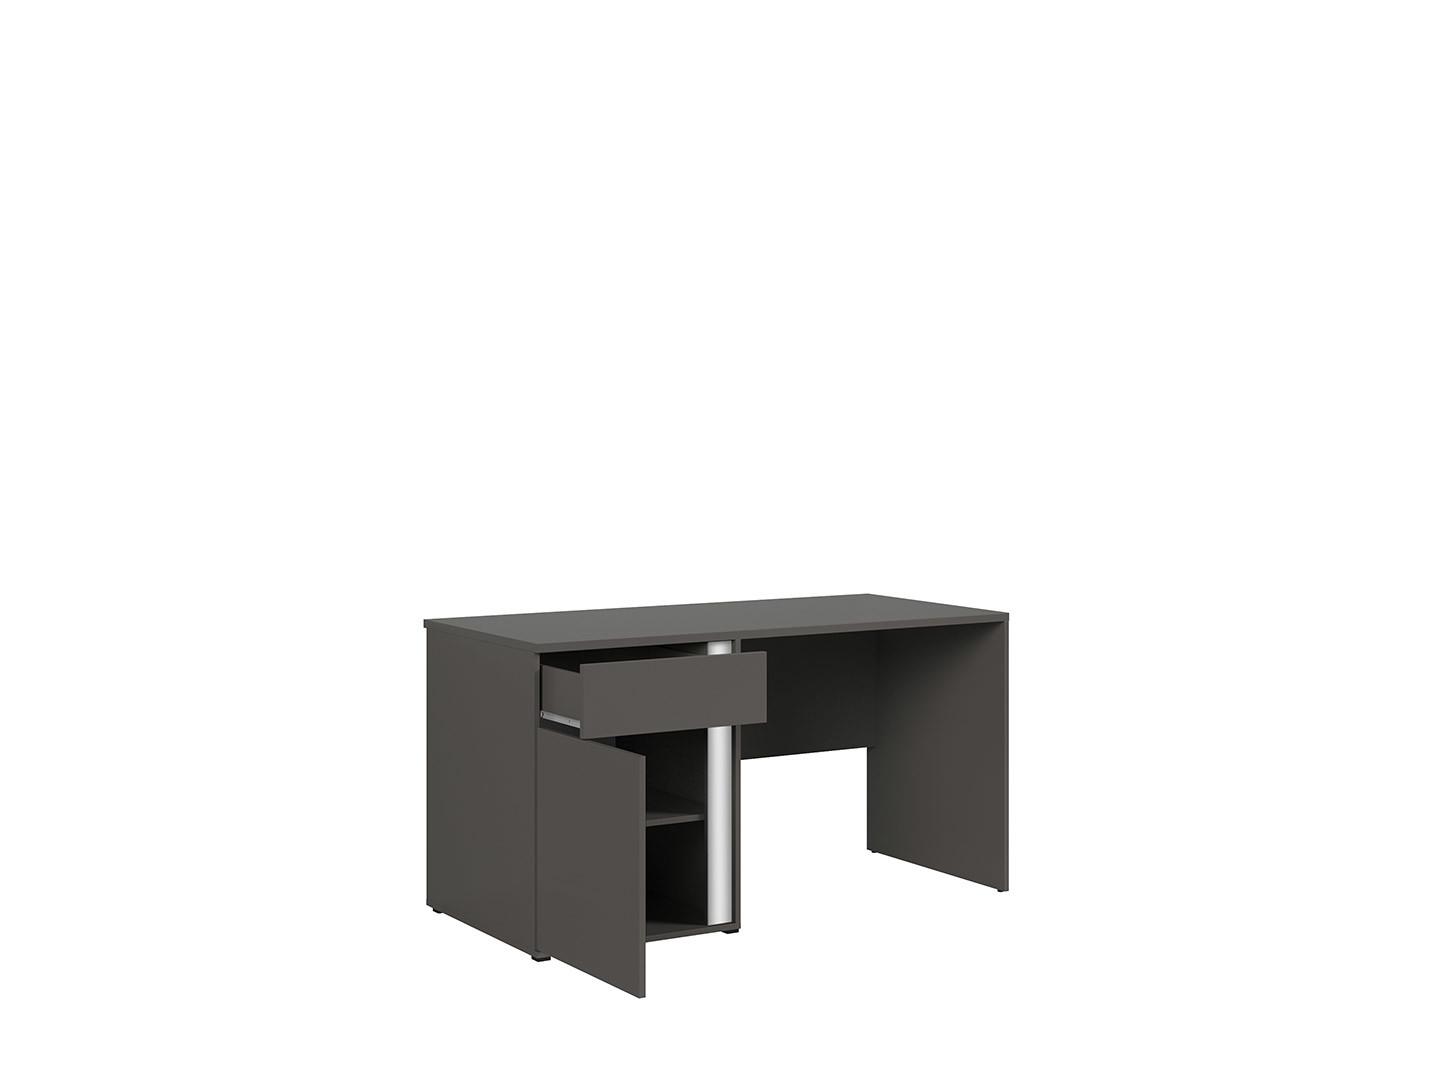 Kancelársky stôl GRAPHIC BIU1D1SL/C sivý wolfram